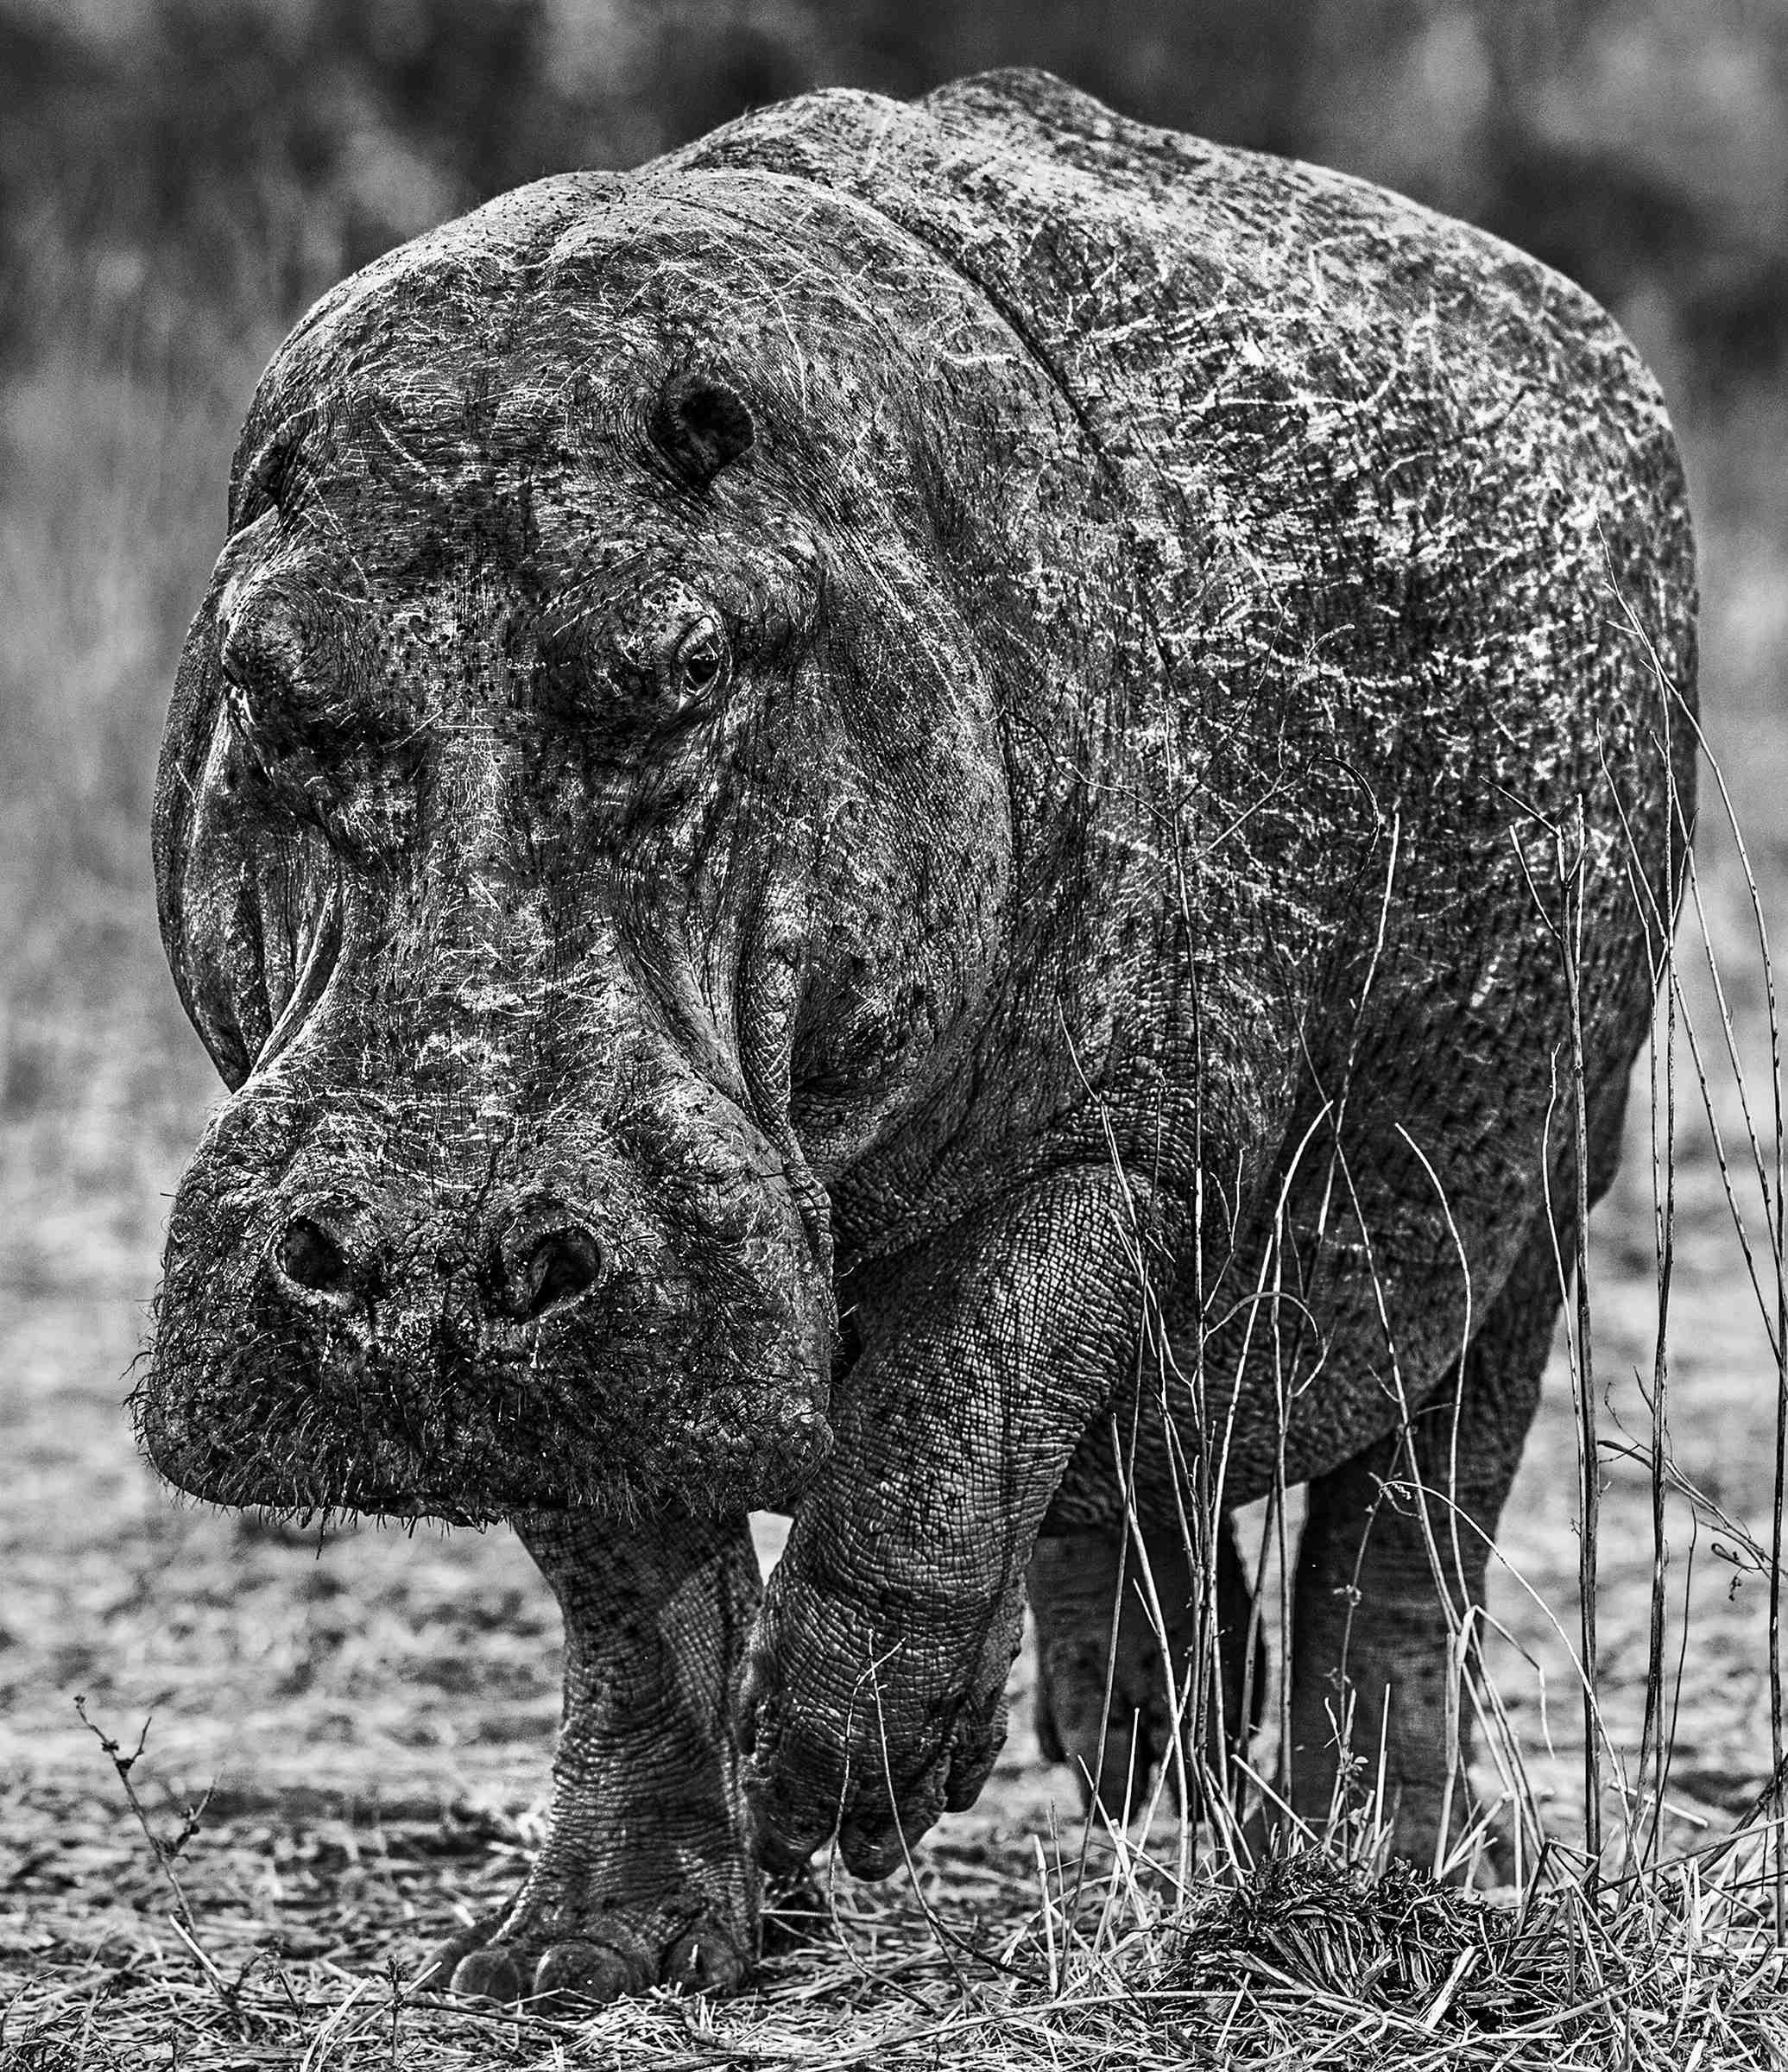 David Yarrow Hippos in Zambia 3